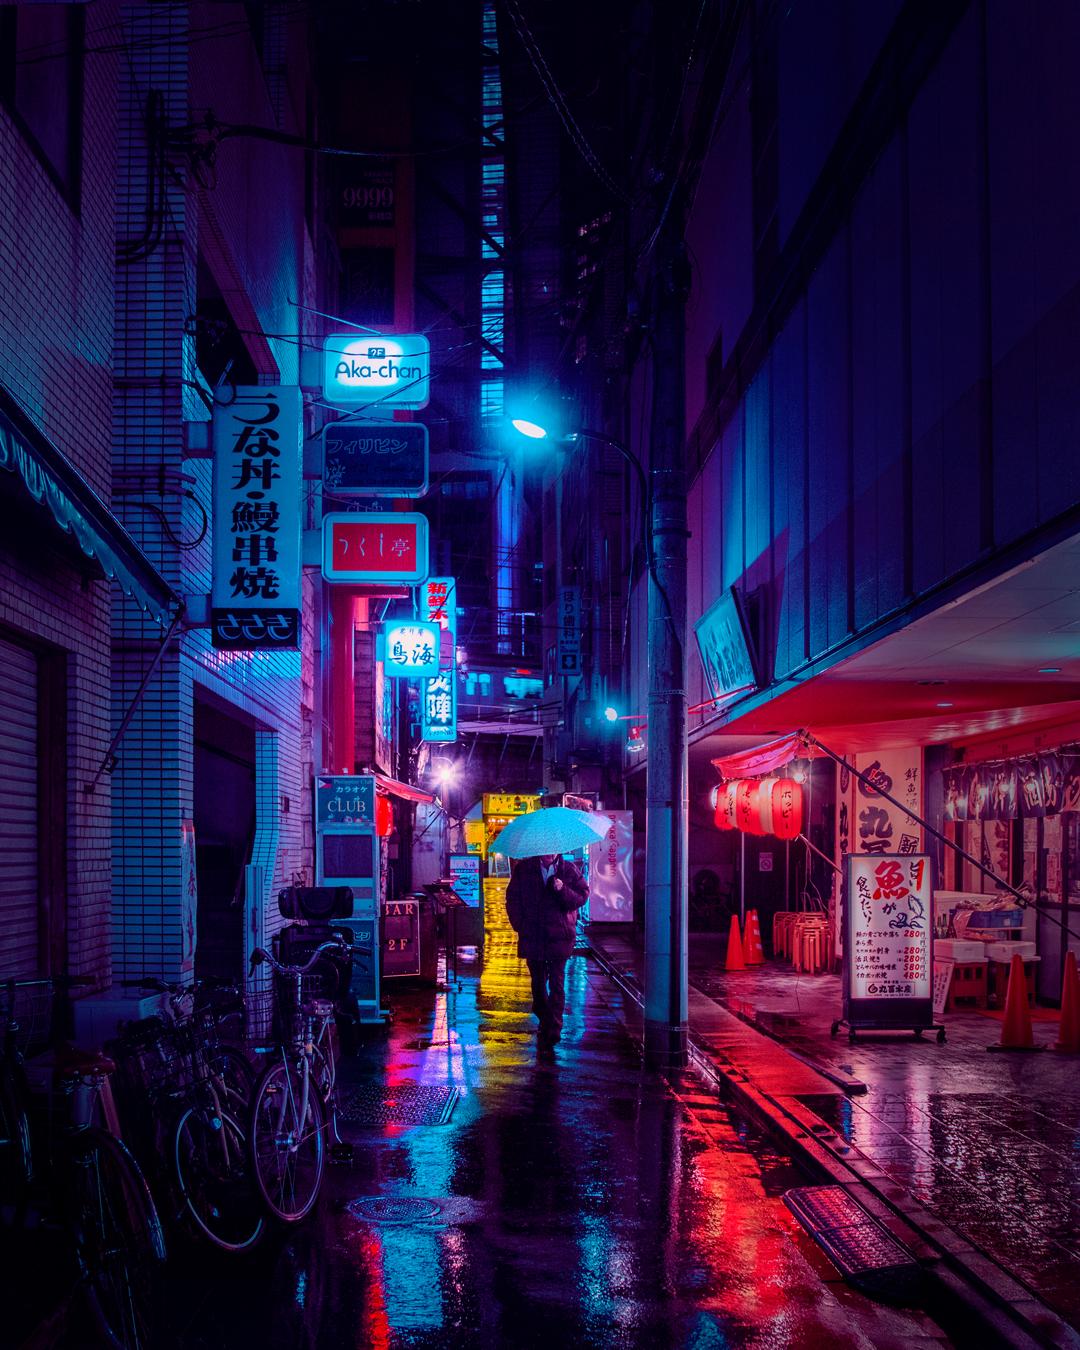 flashy neon lit night scene - HD1080×1350